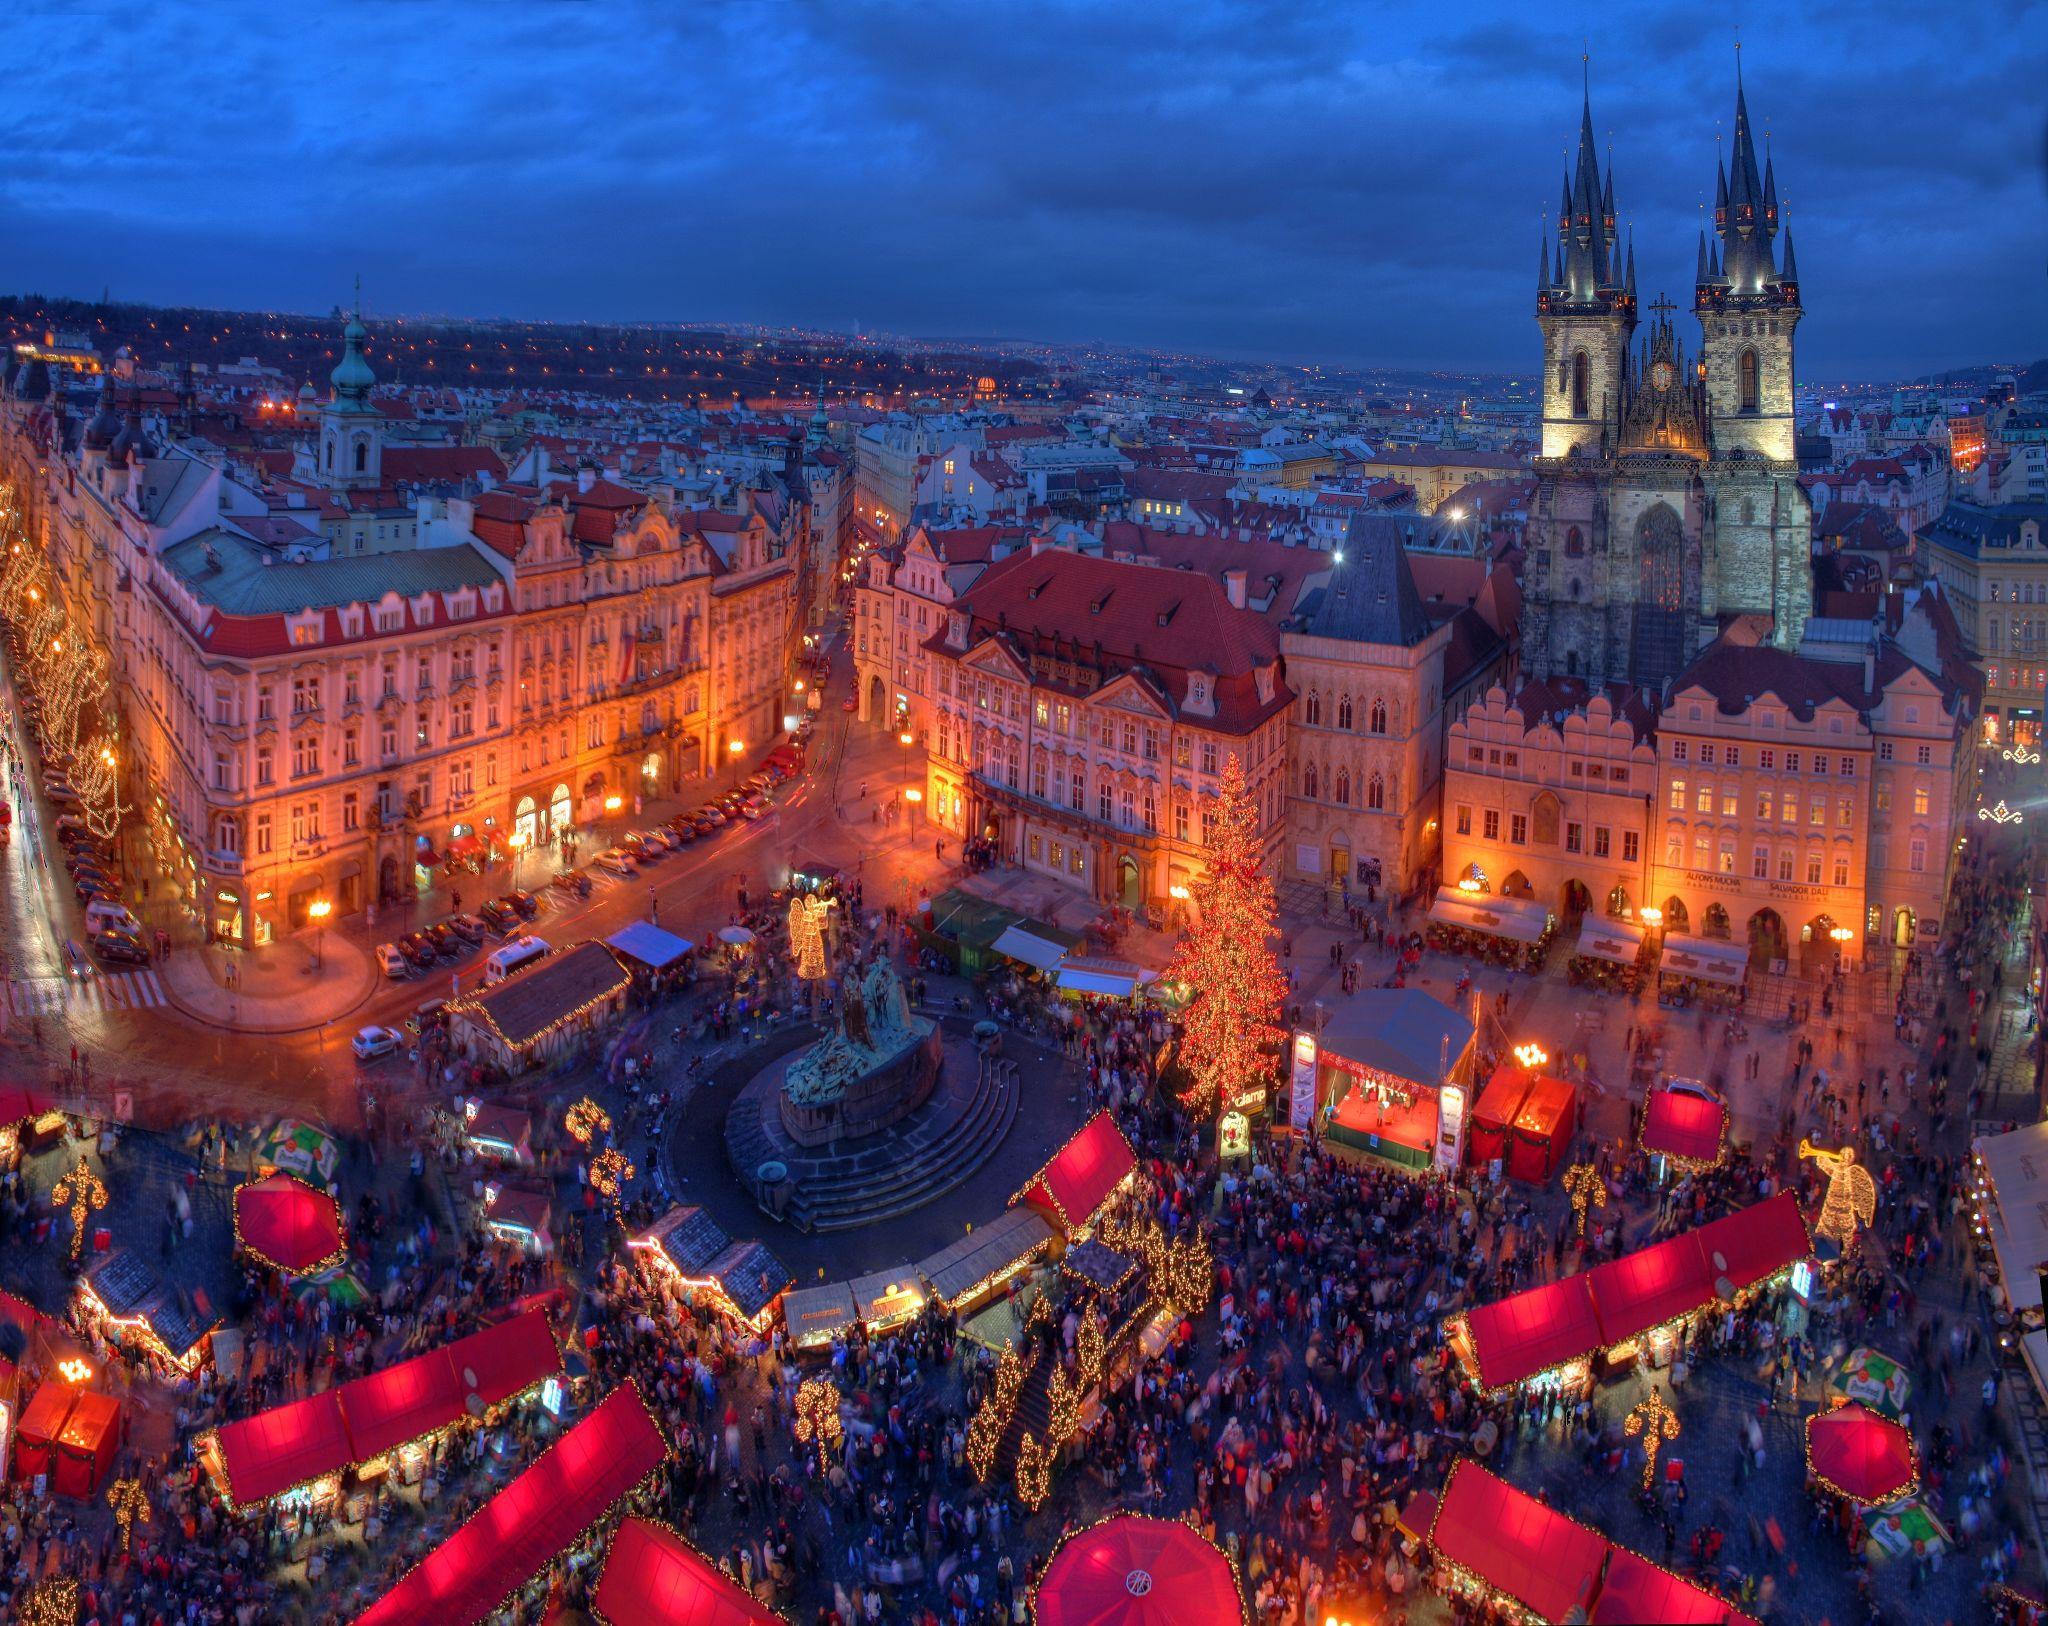 Christmas In Europe Wallpaper.Christmas Market In Prague Hd Wallpaper Background Image